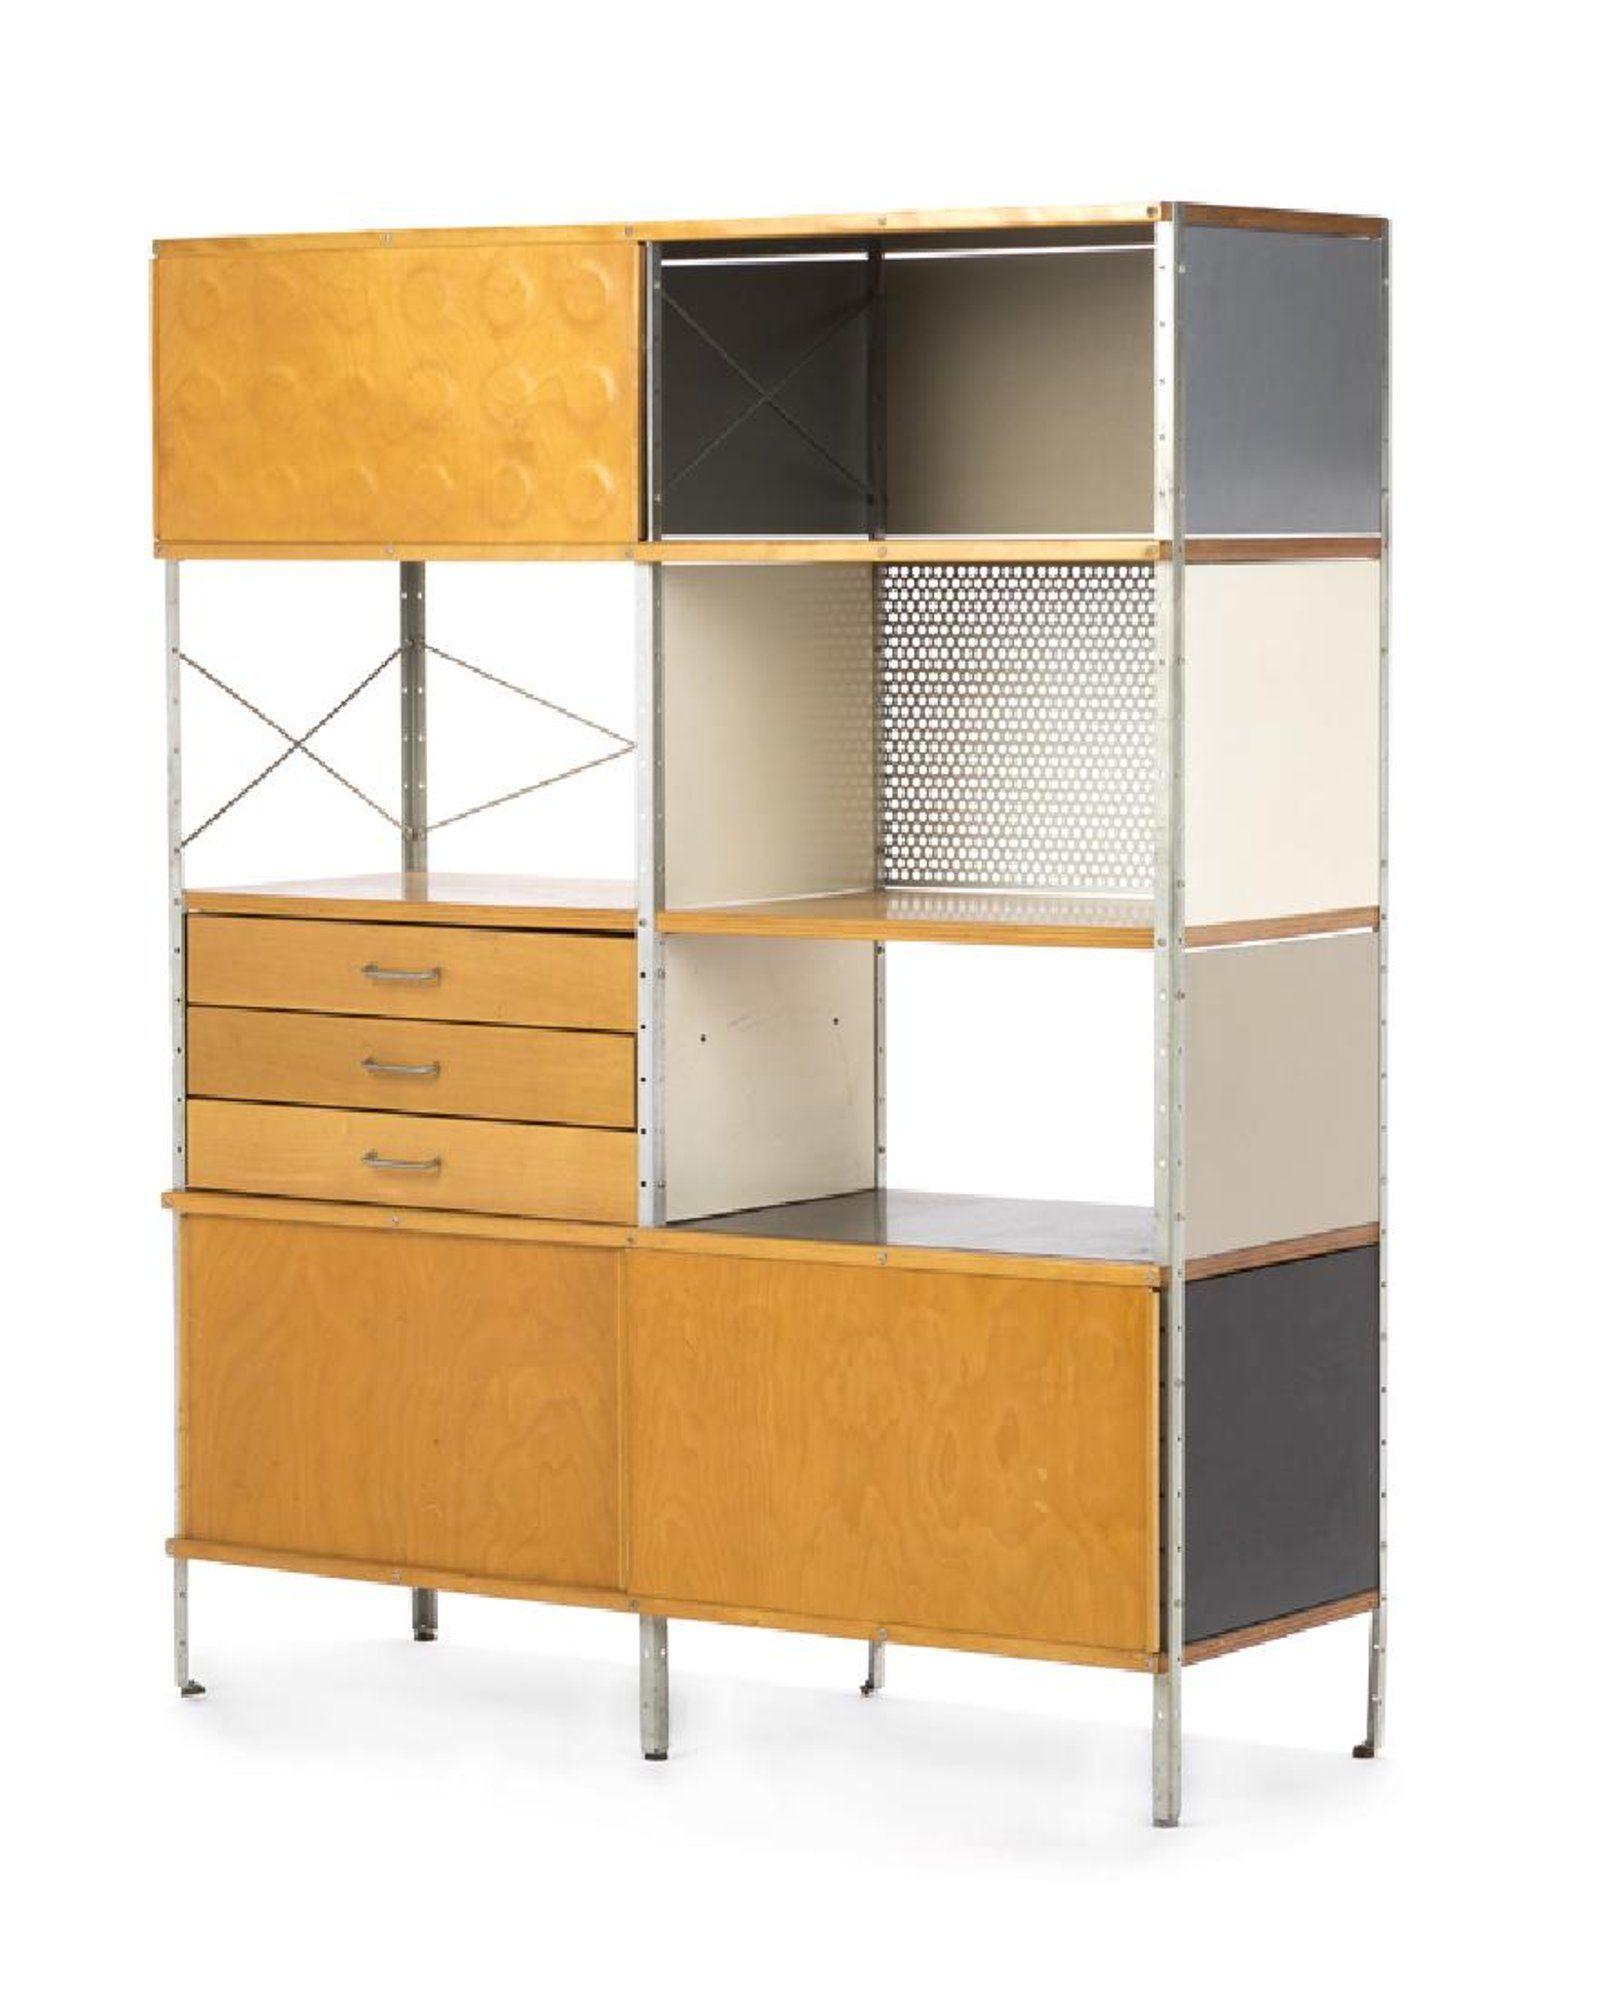 An Eames for Herman Miller modular storage cabinet  sc 1 st  Pinterest & An Eames for Herman Miller modular storage cabinet | Diseño danés ...